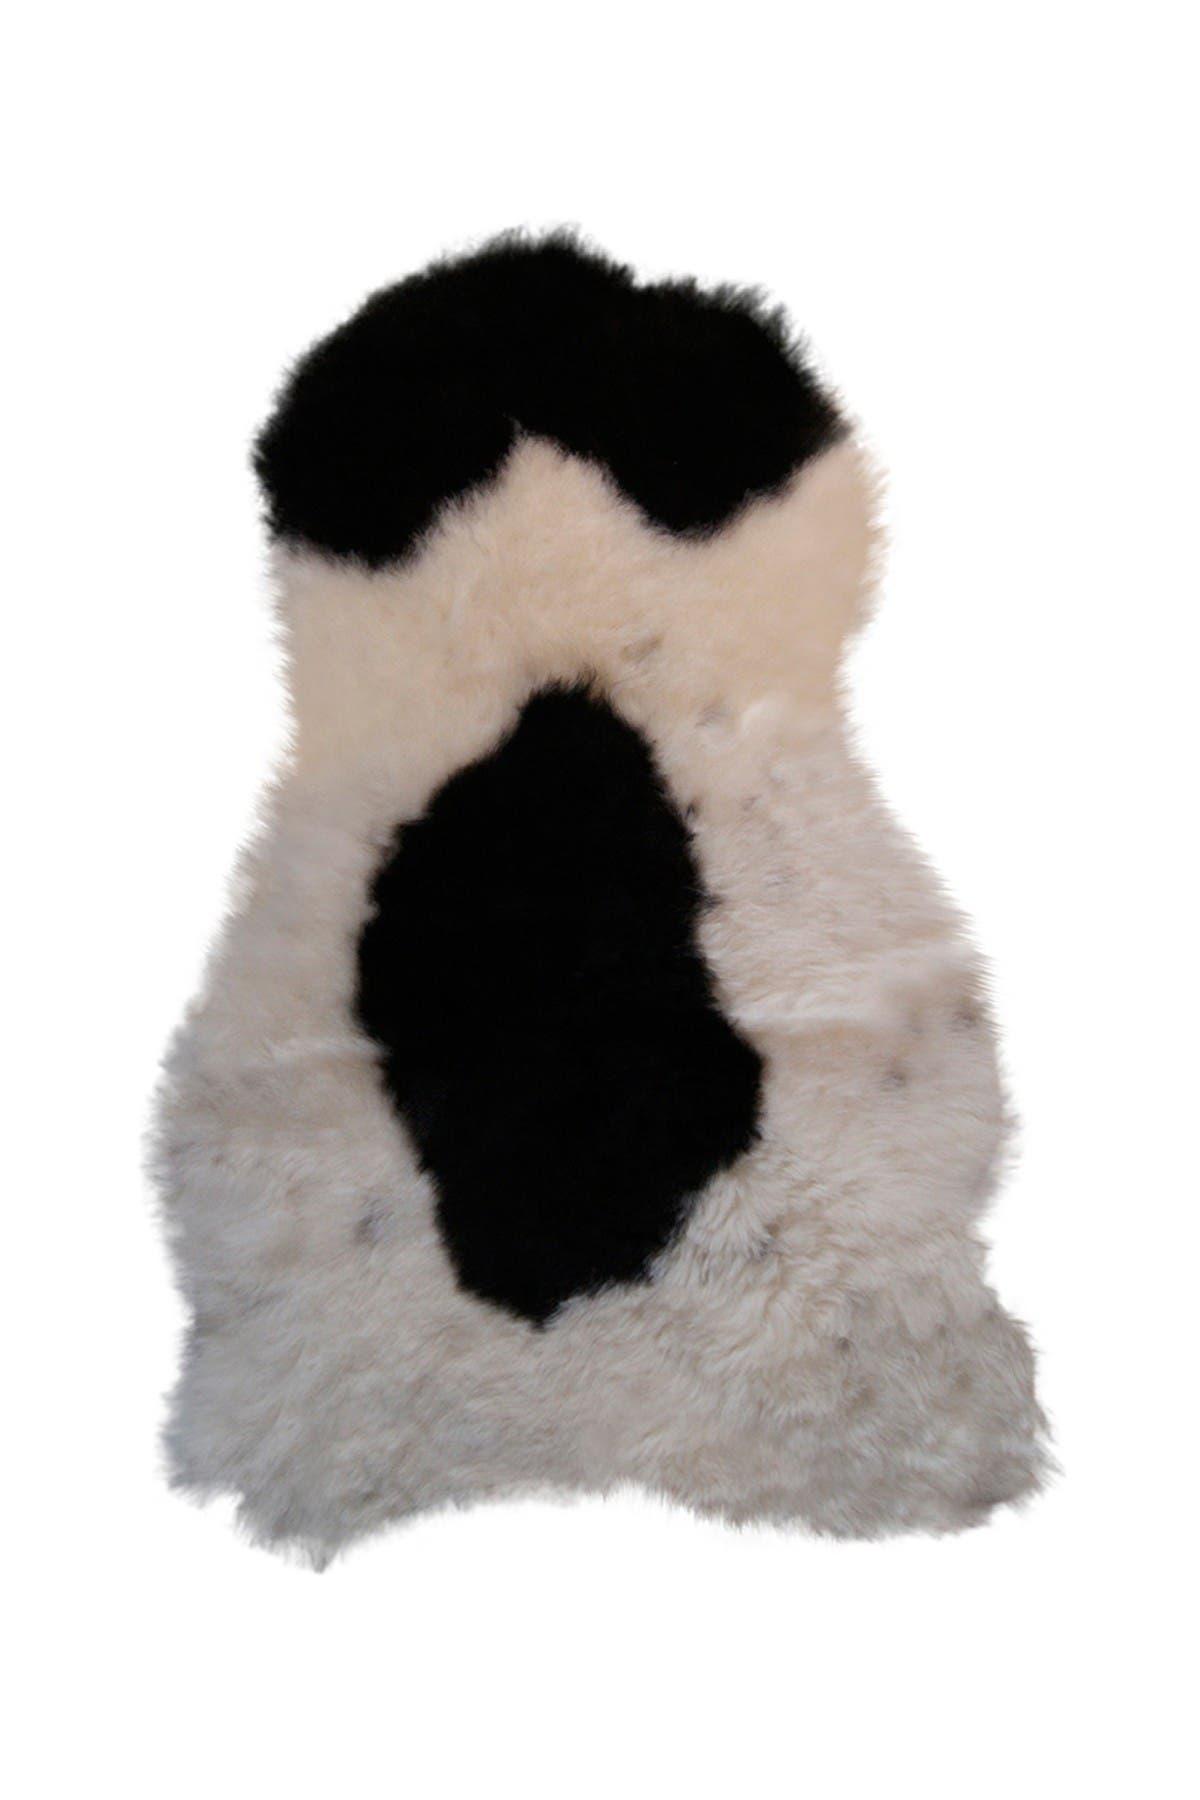 Image of Natural Icelandic Genuine Sheepskin Single Sheared Rug - Spotted